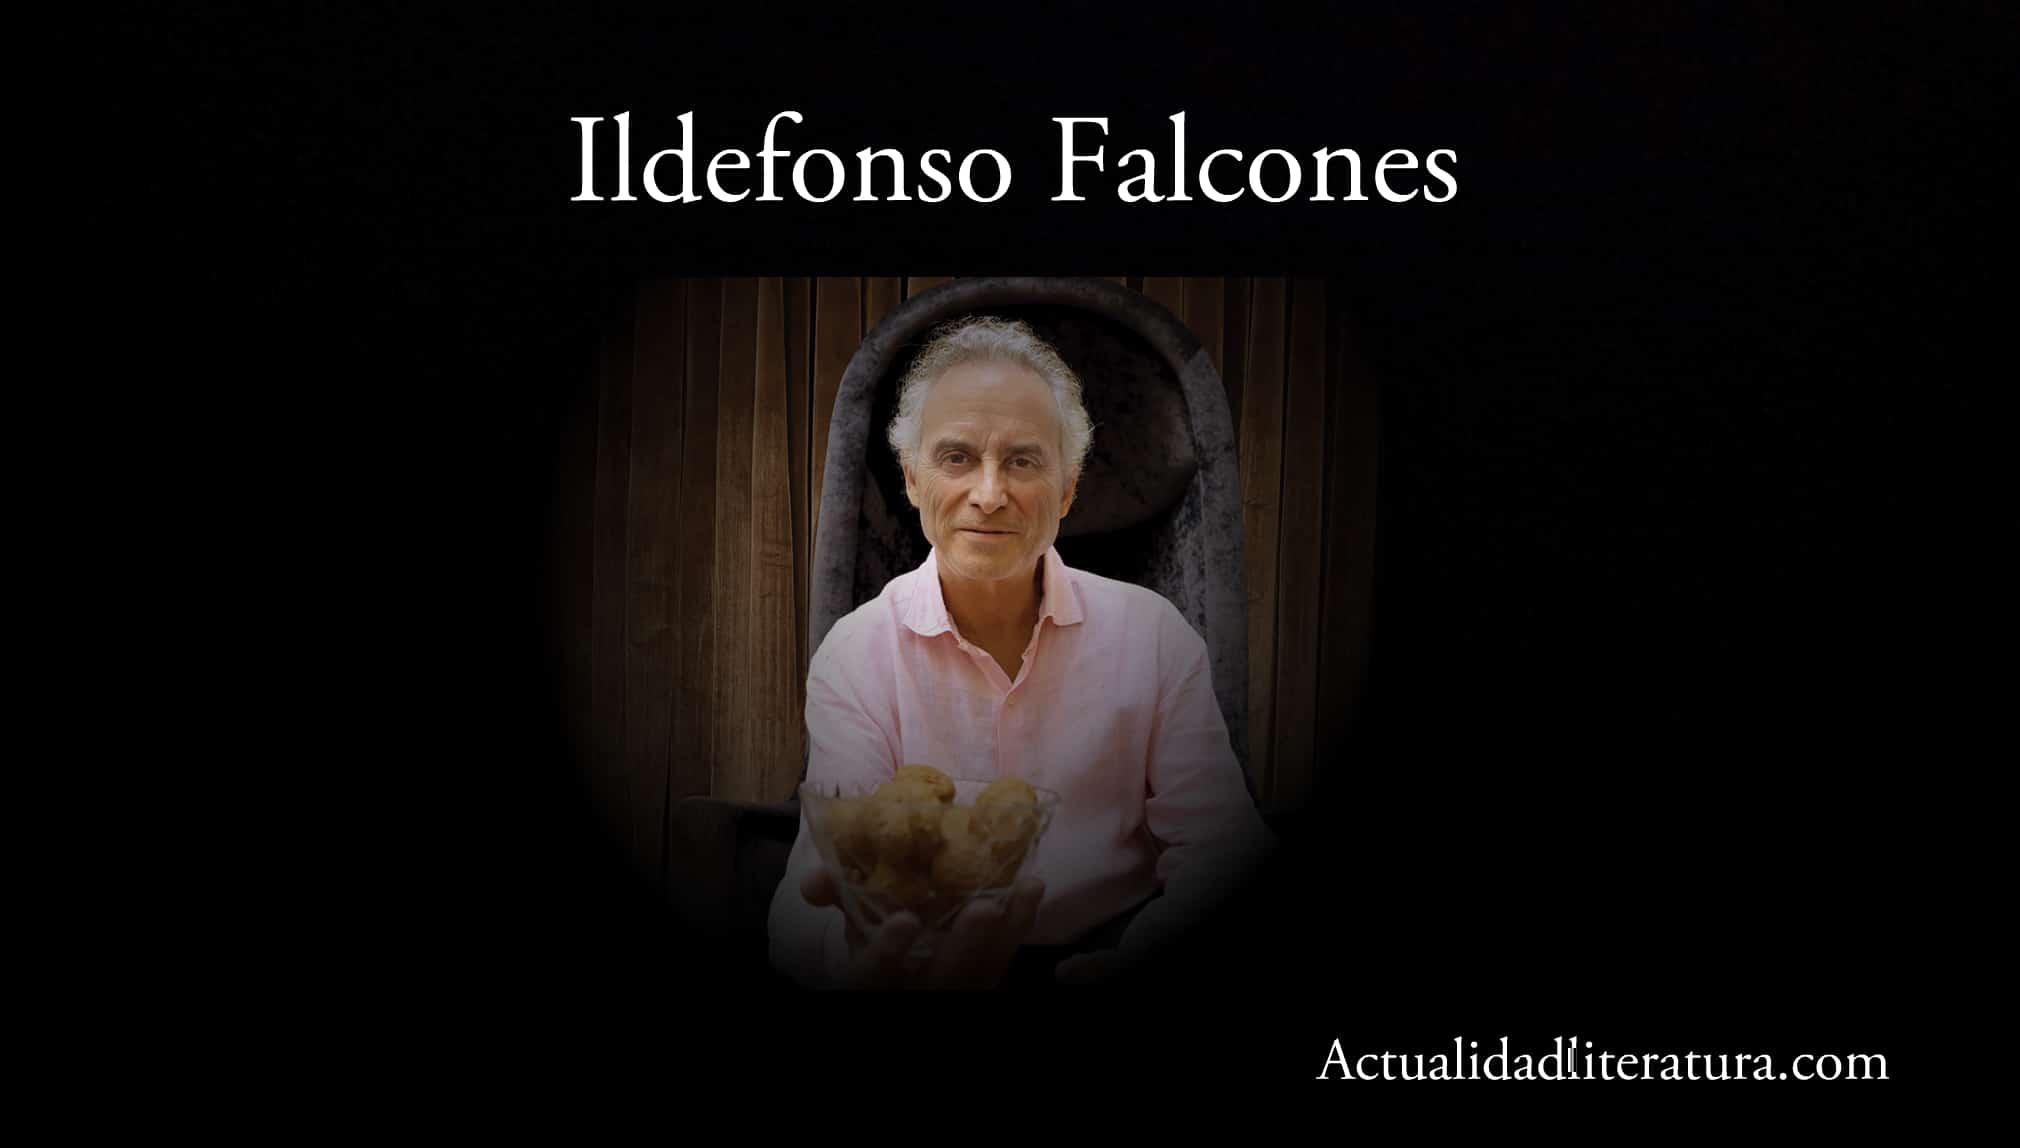 Ildefonso Falcones.